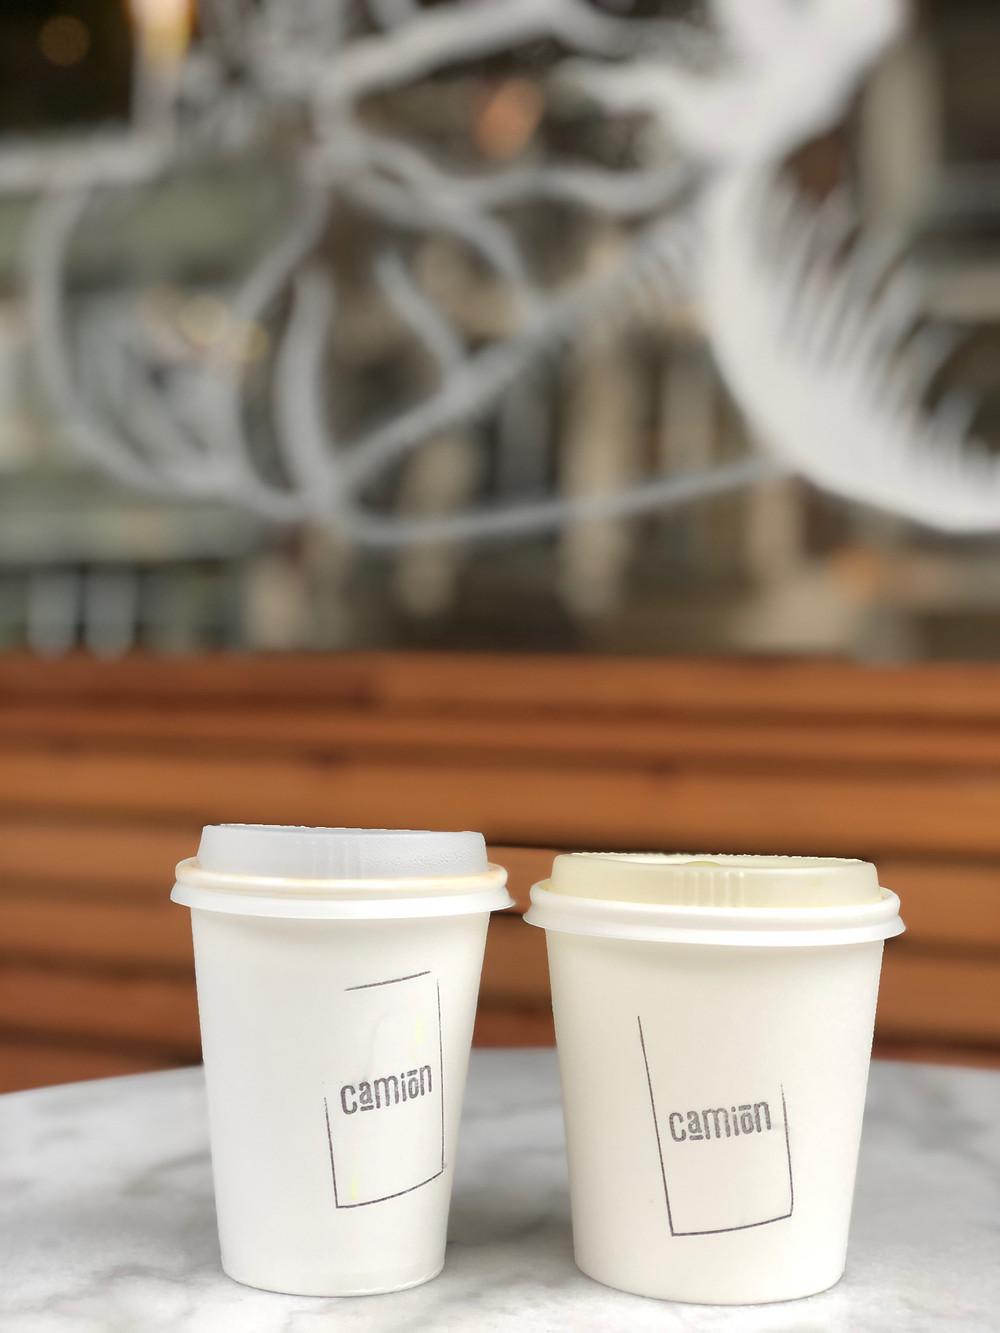 Camion coffee, Antwerp